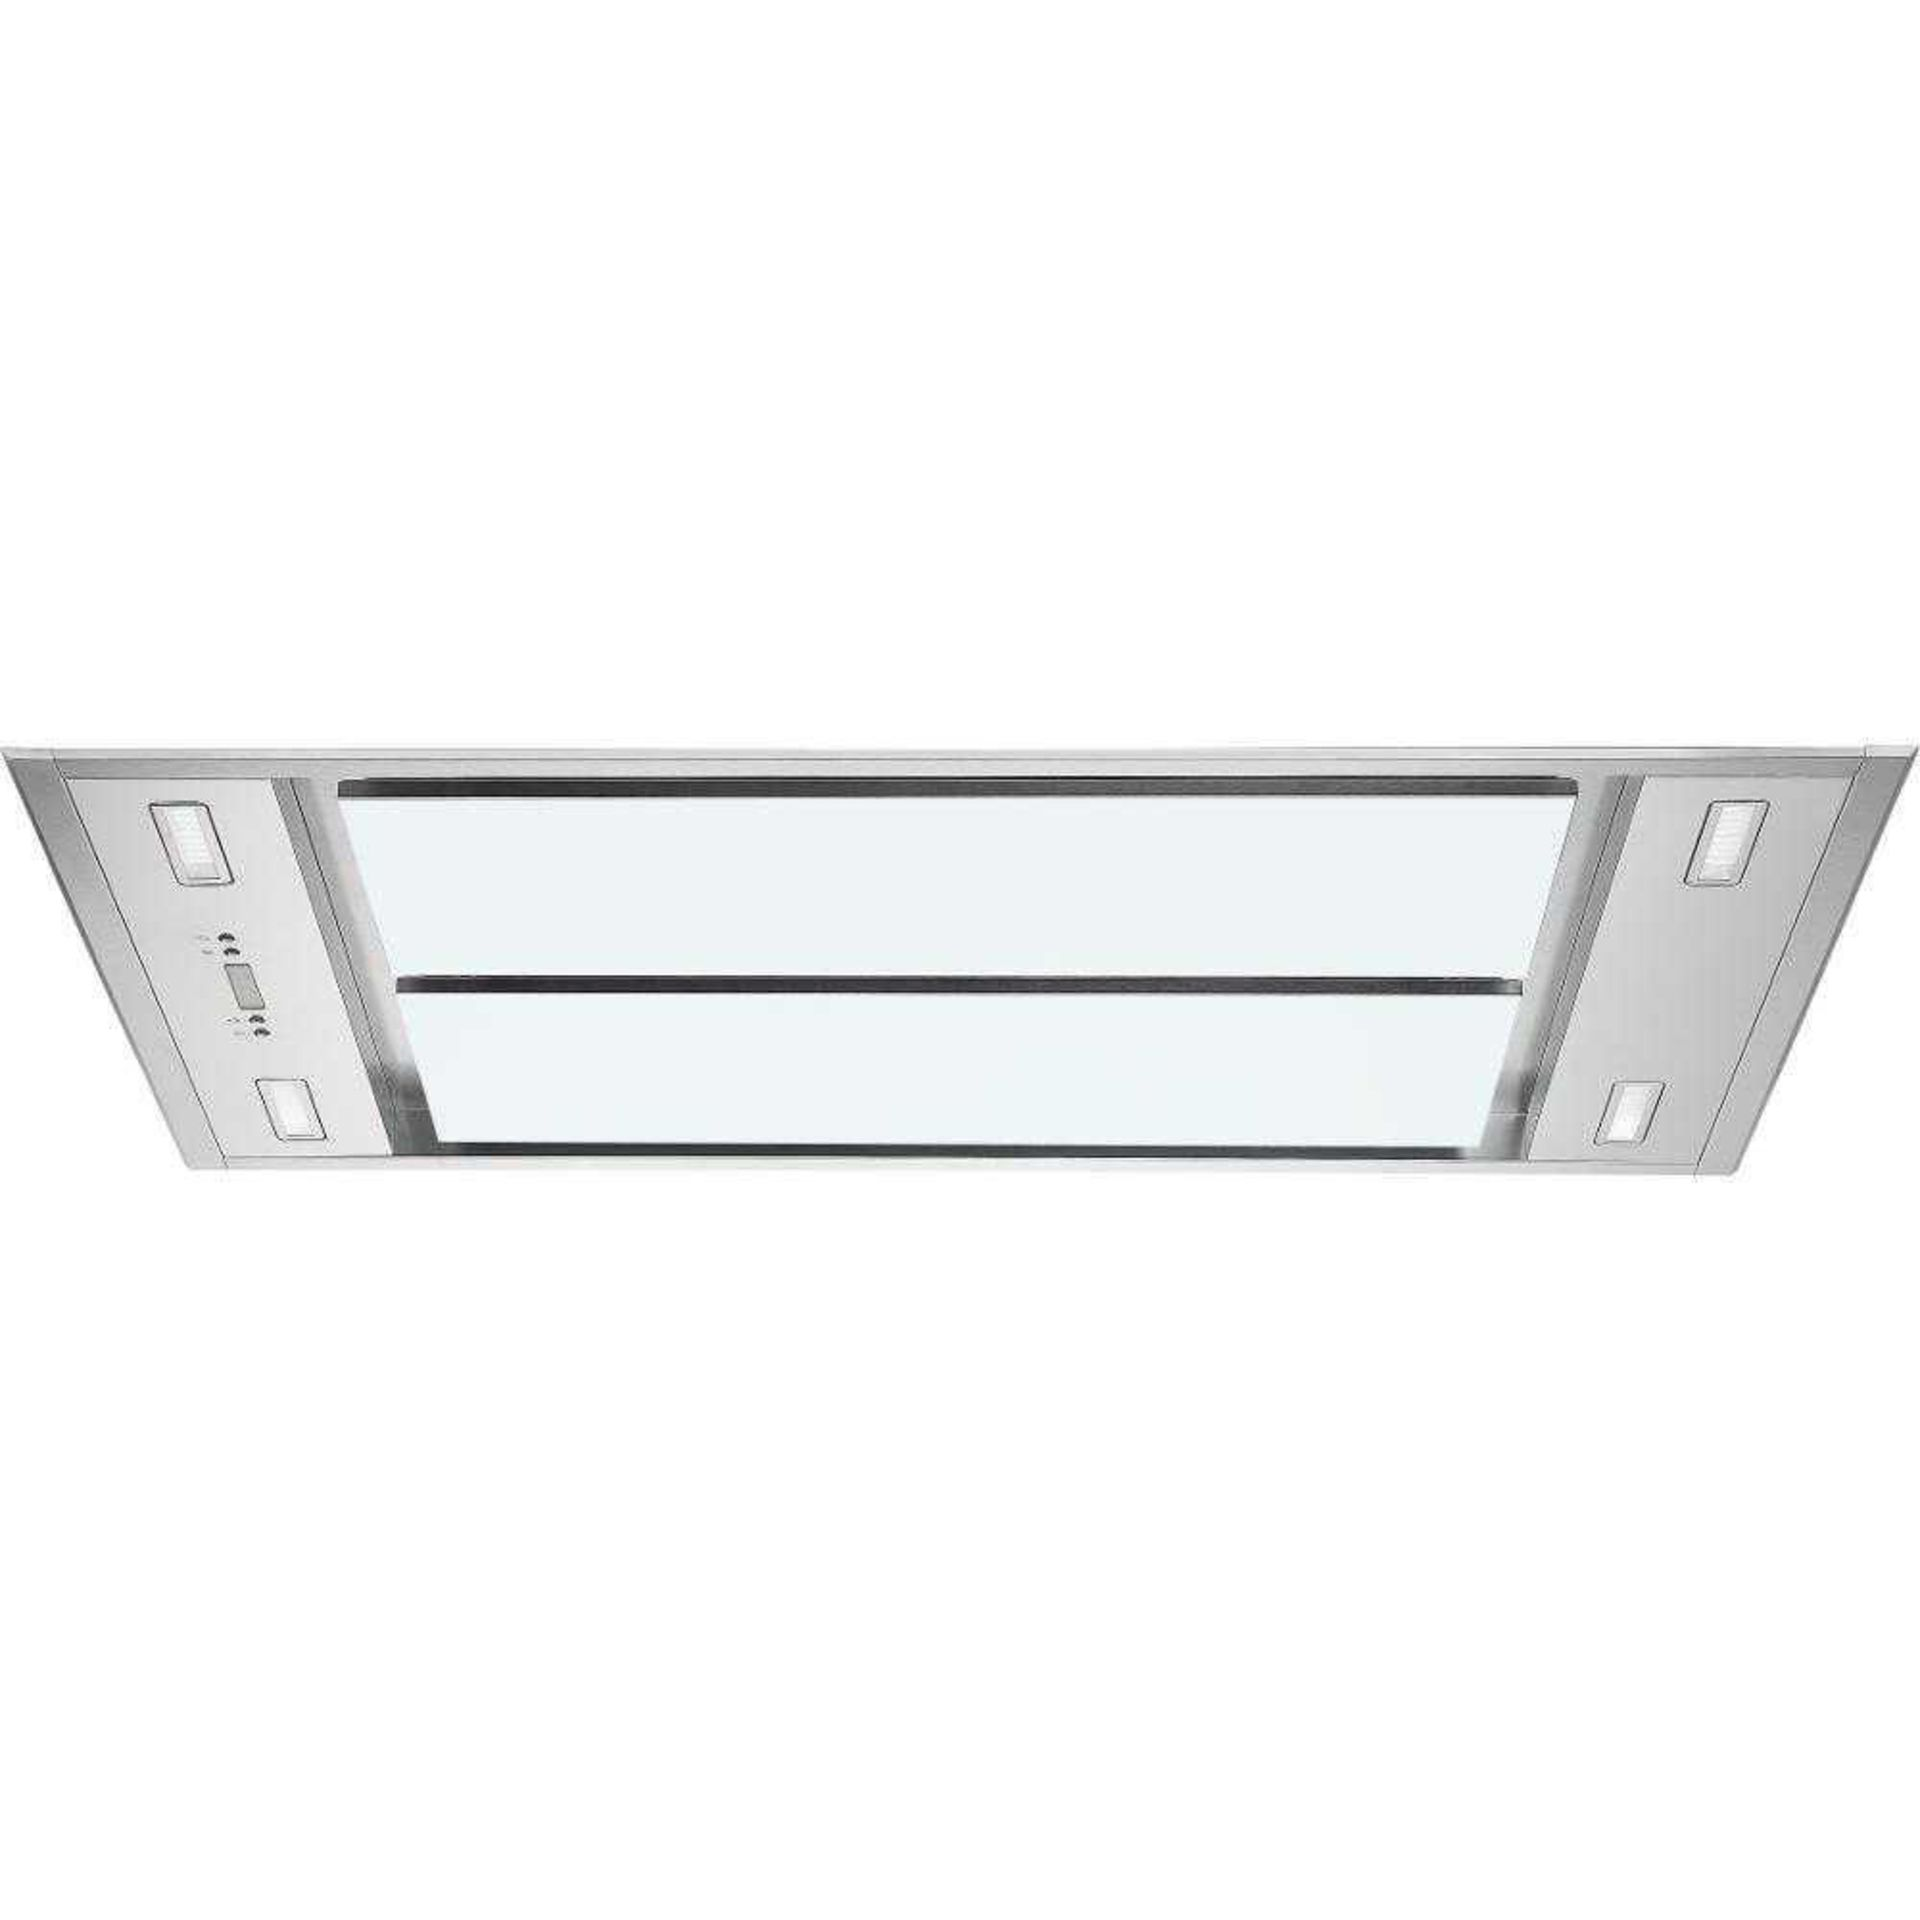 Lot 461 - Rrp £400 Ceiling Extractor Fan